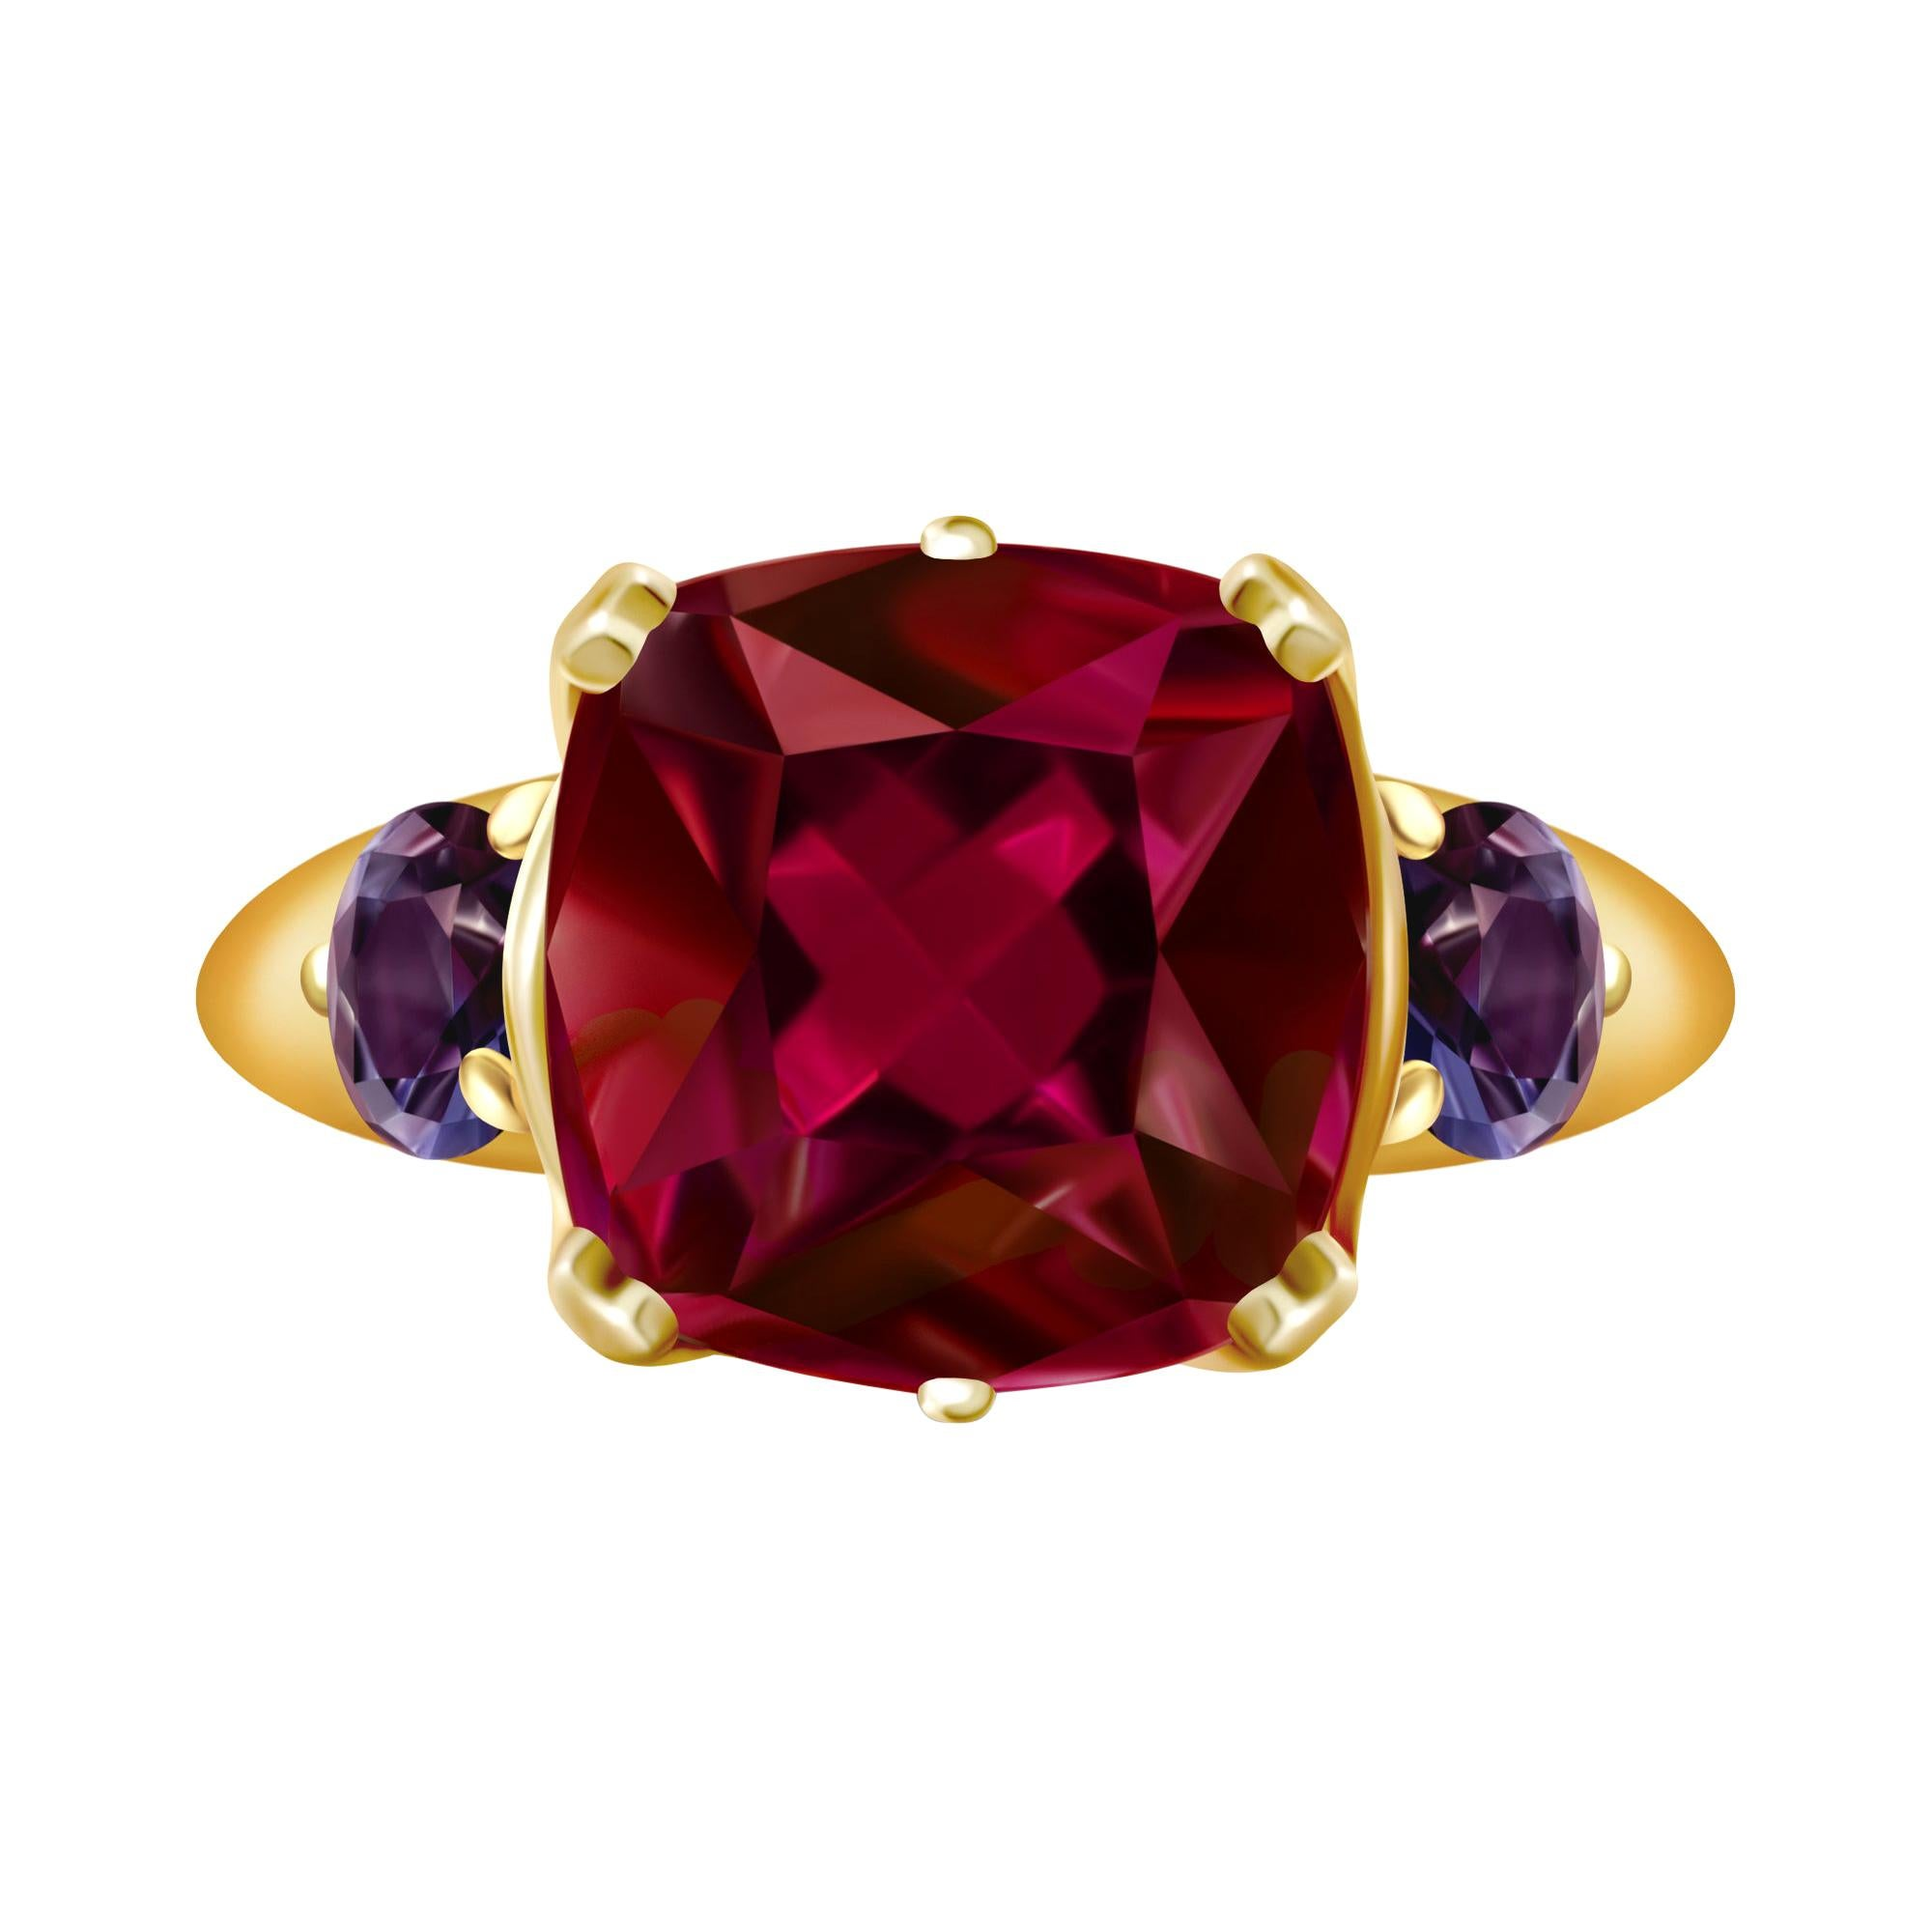 9 Carat Burgundy Red Rhodolite Garnet and Spinel 18 Karat Yellow Gold Ring